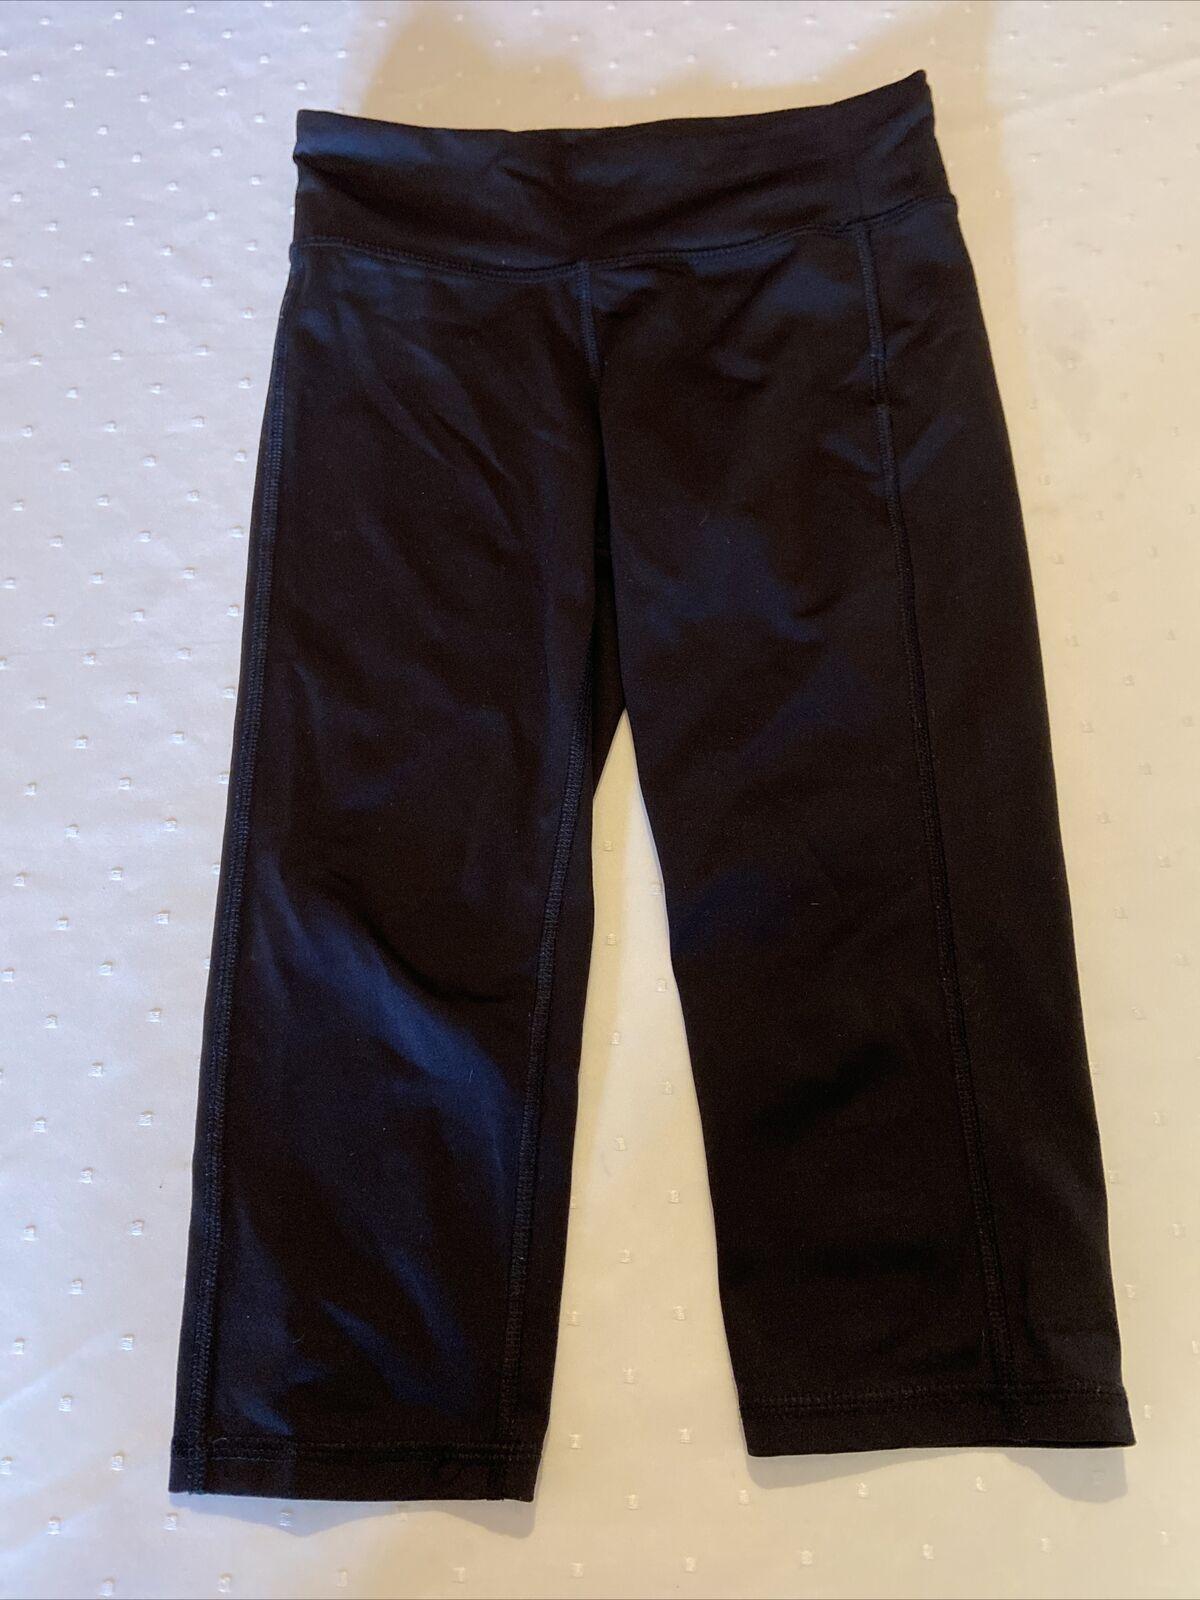 Old Navy women's active wear Capri size S / P (6-7) GO DRY